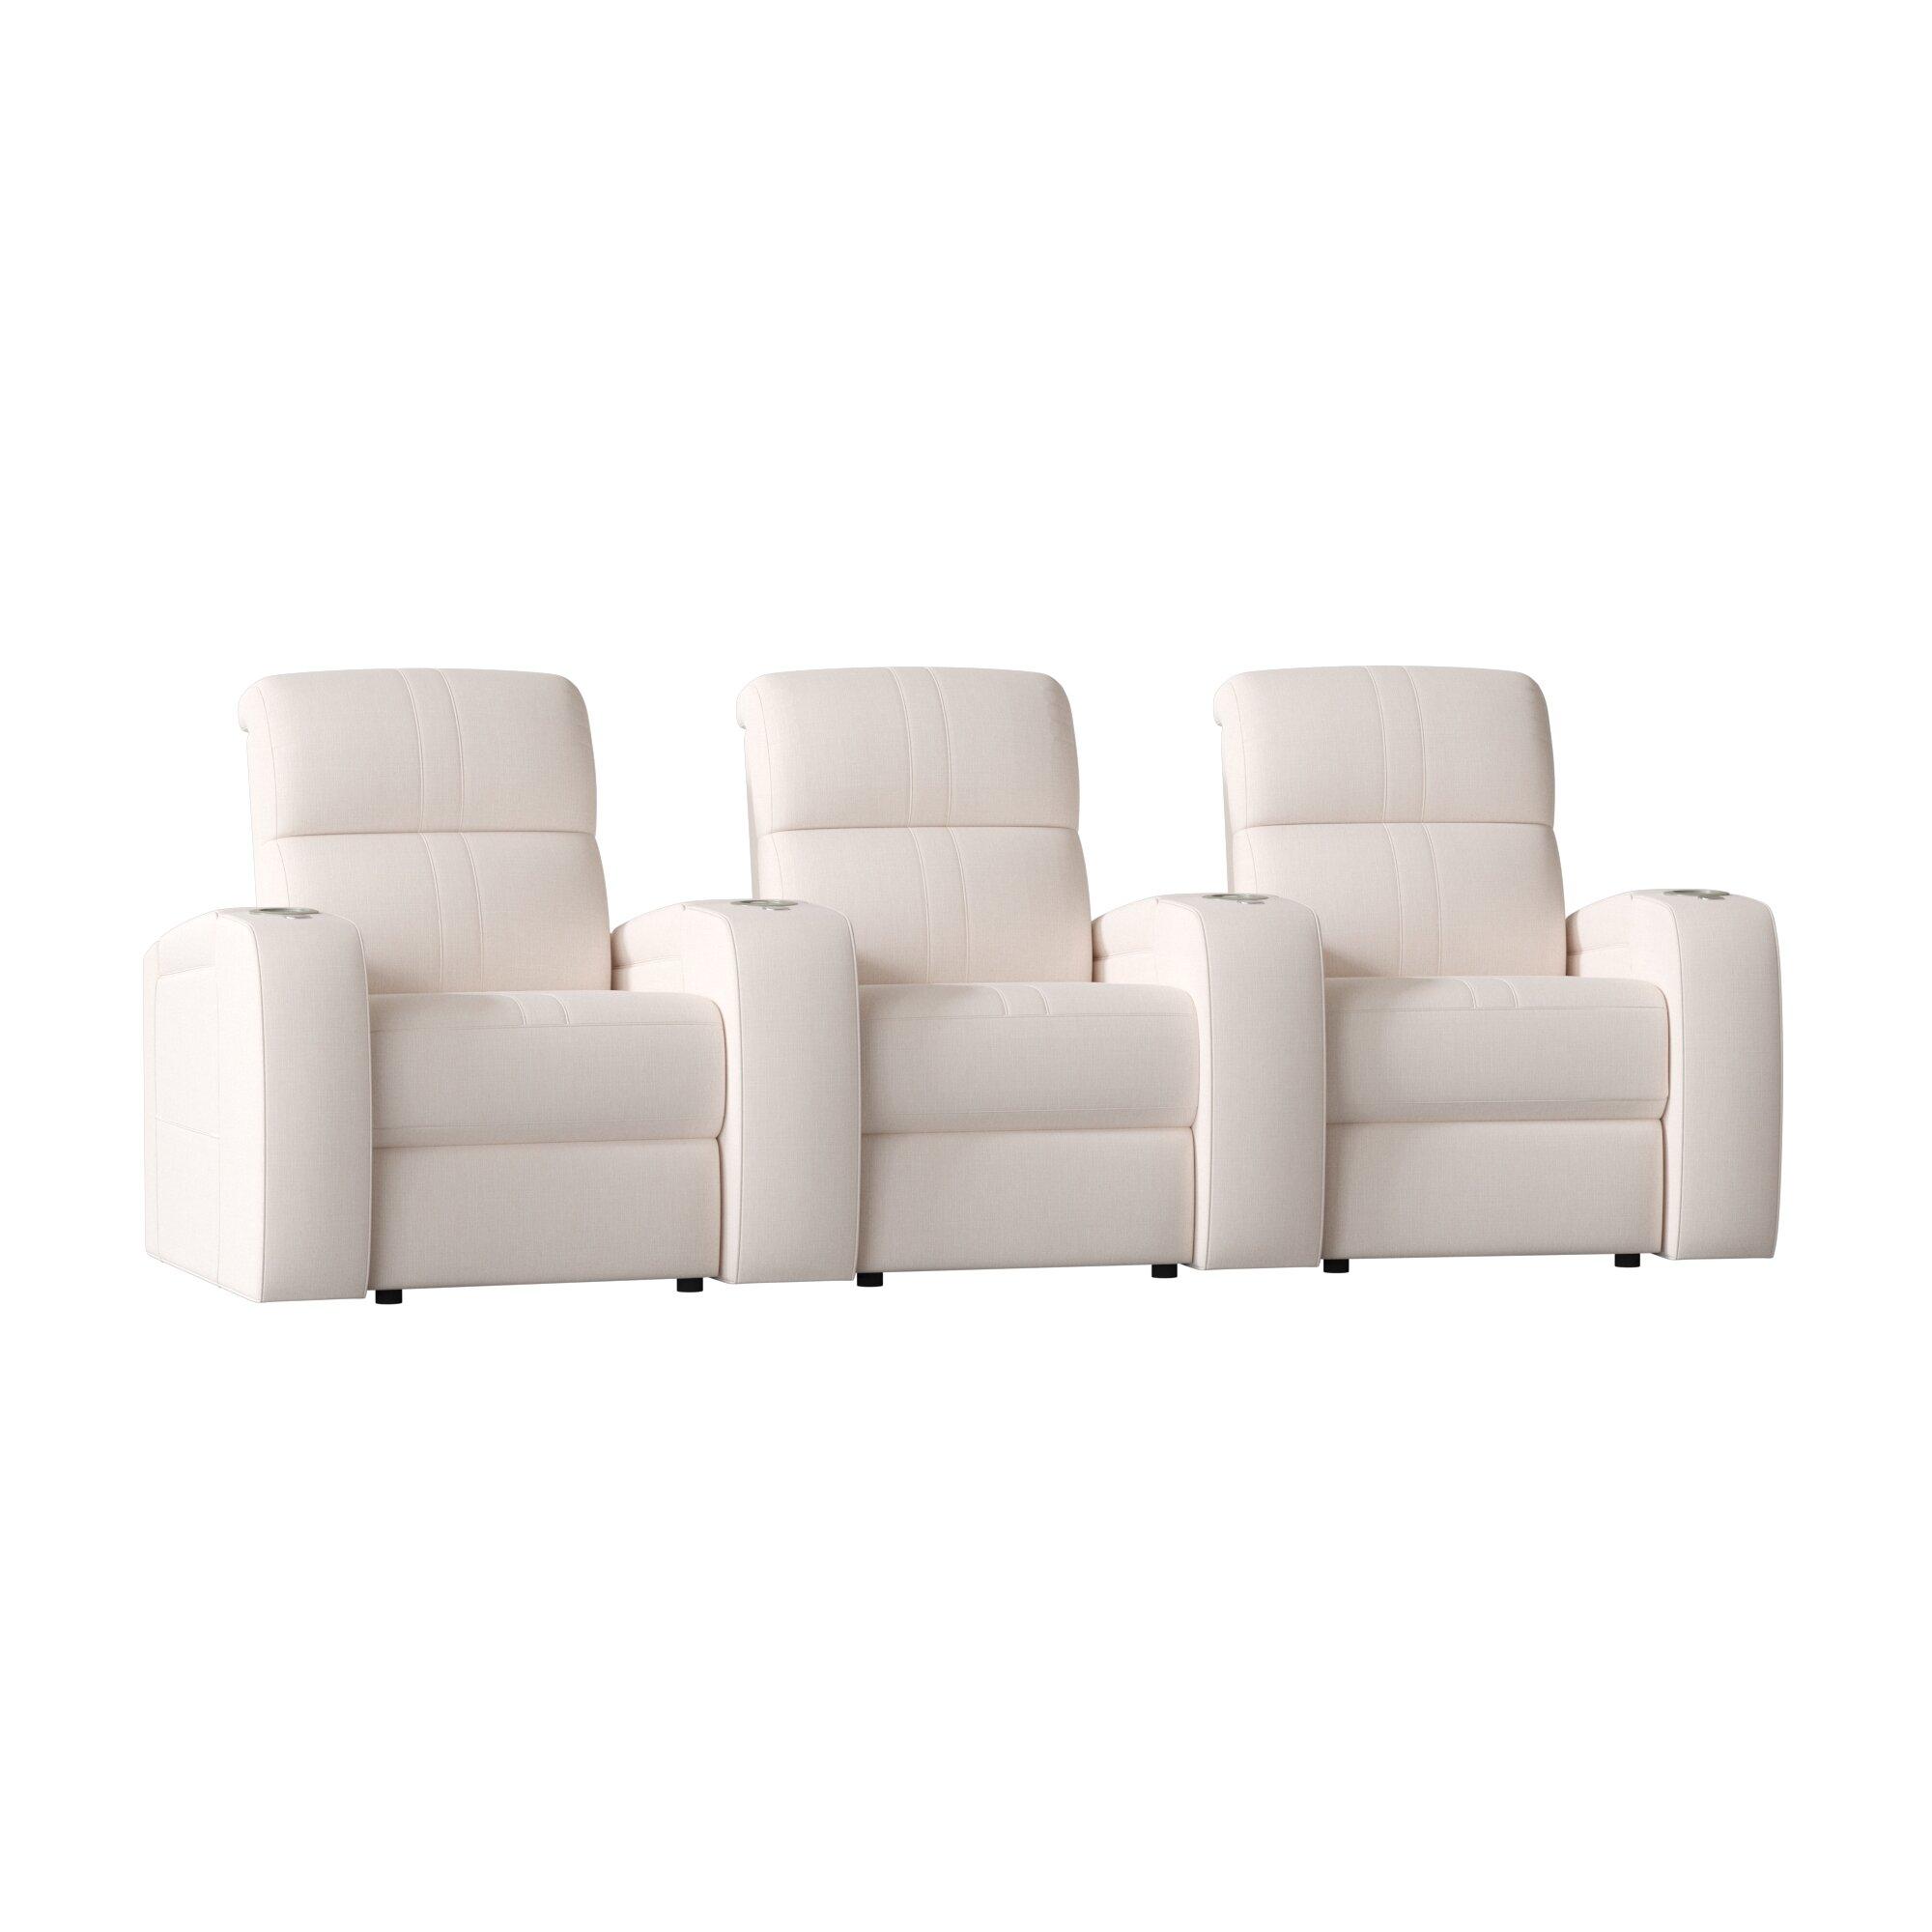 Palliser Furniture Corbett Curved Home